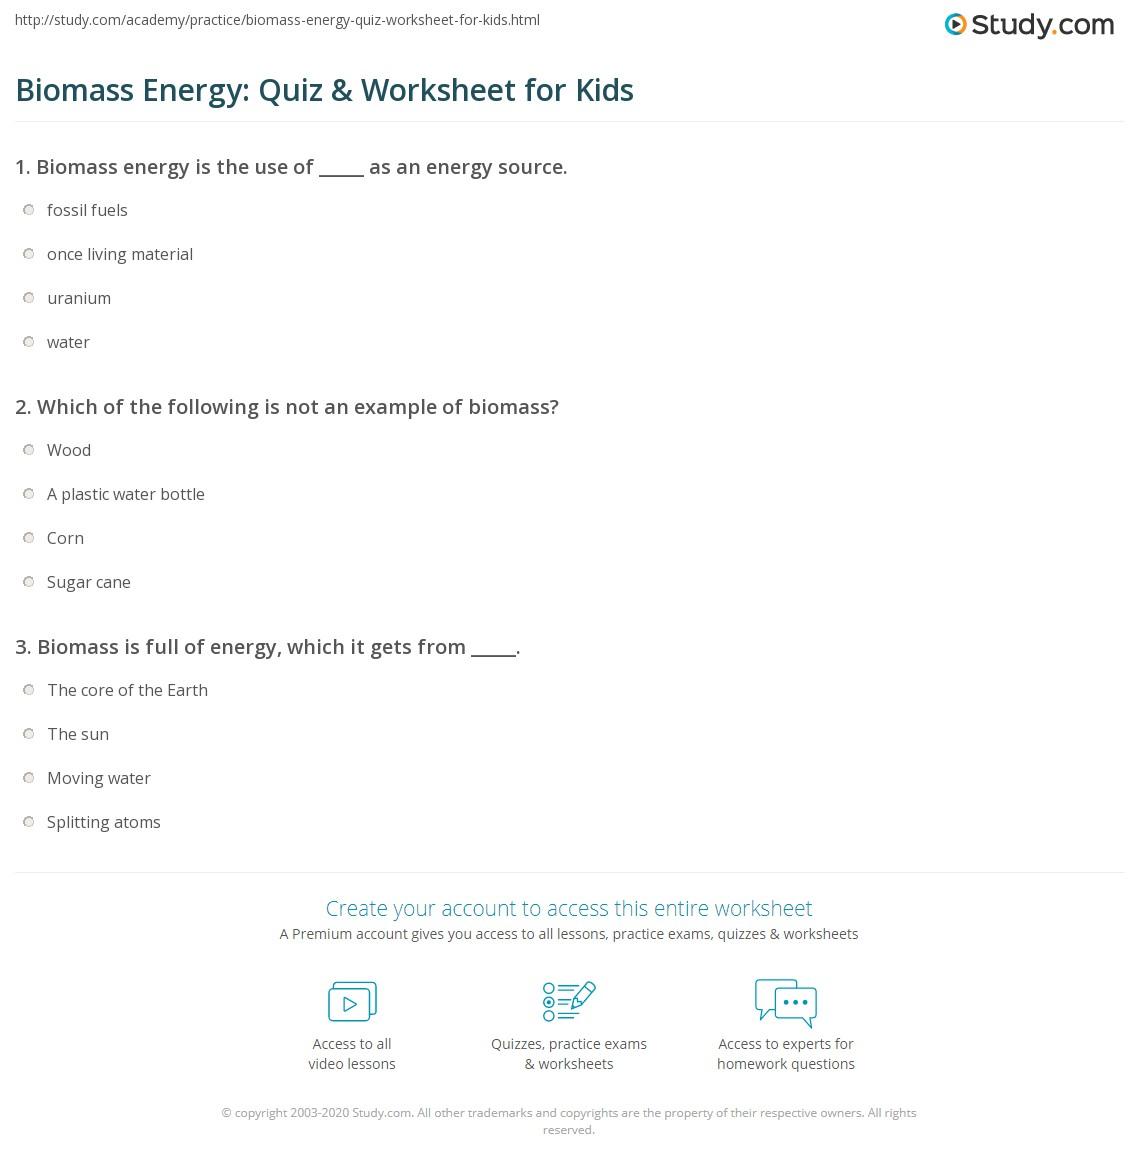 Biomass Energy: Quiz & Worksheet for Kids | Study com